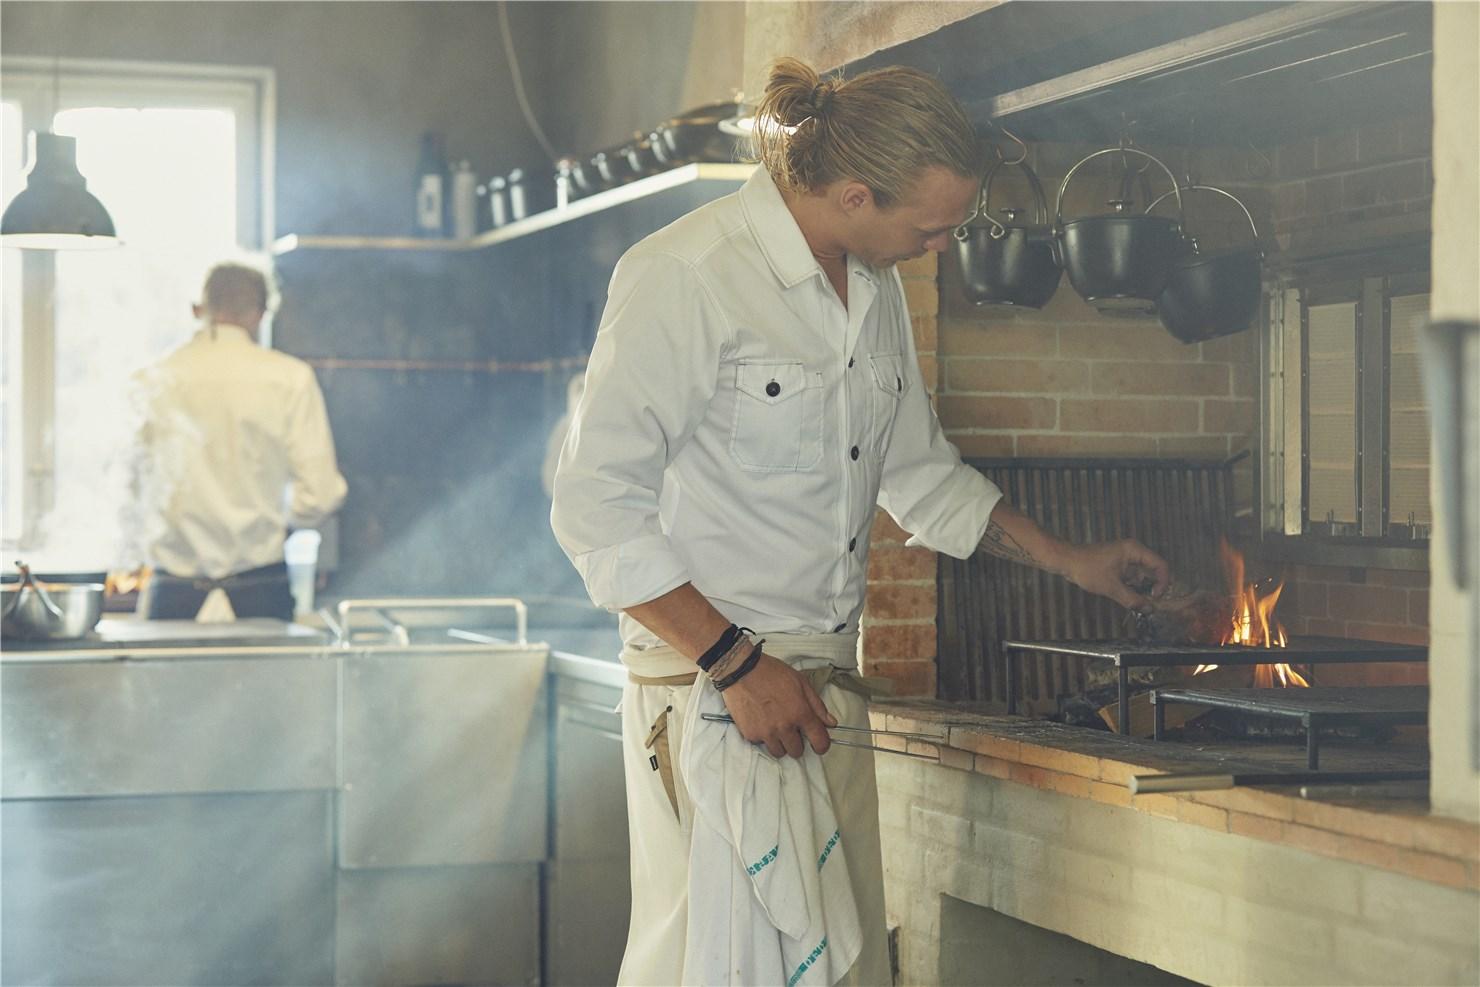 Kentaur Kochschürze und Kochhemd